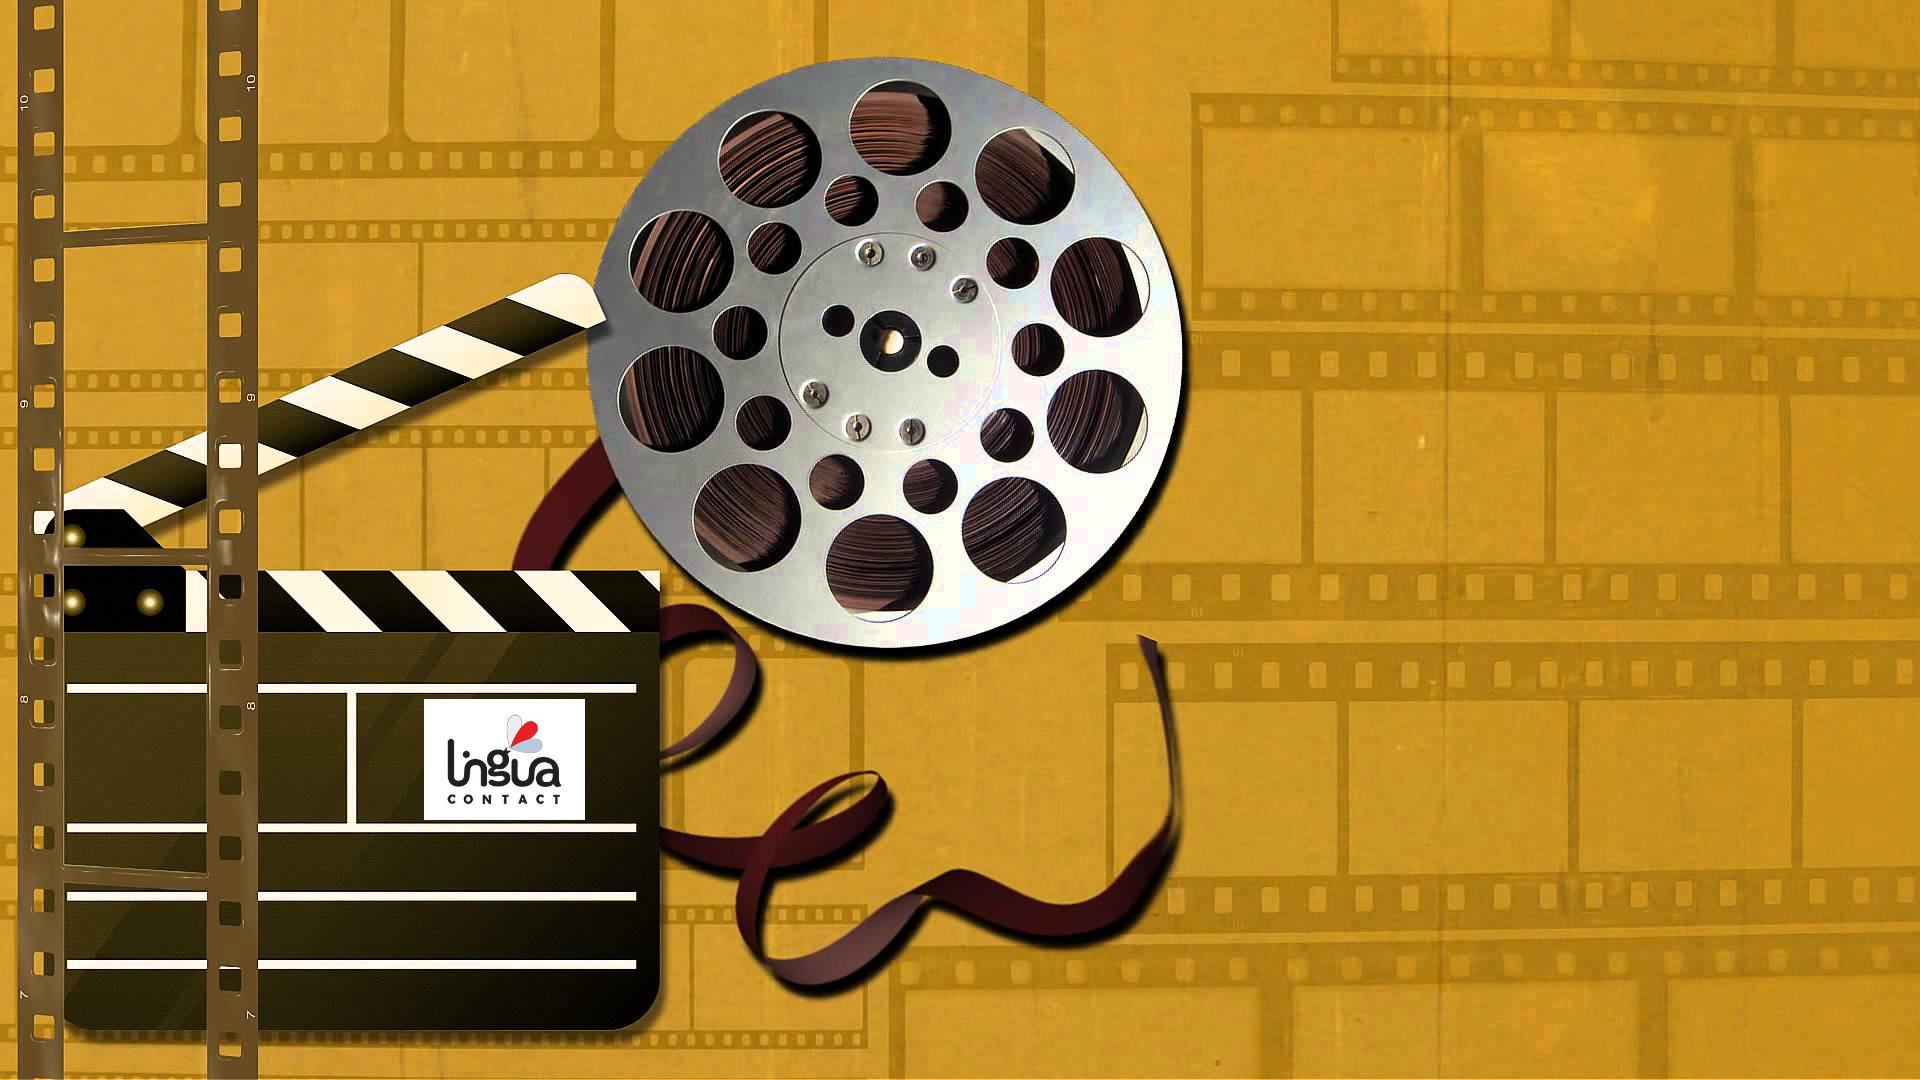 Кинохлопушка и кинолента